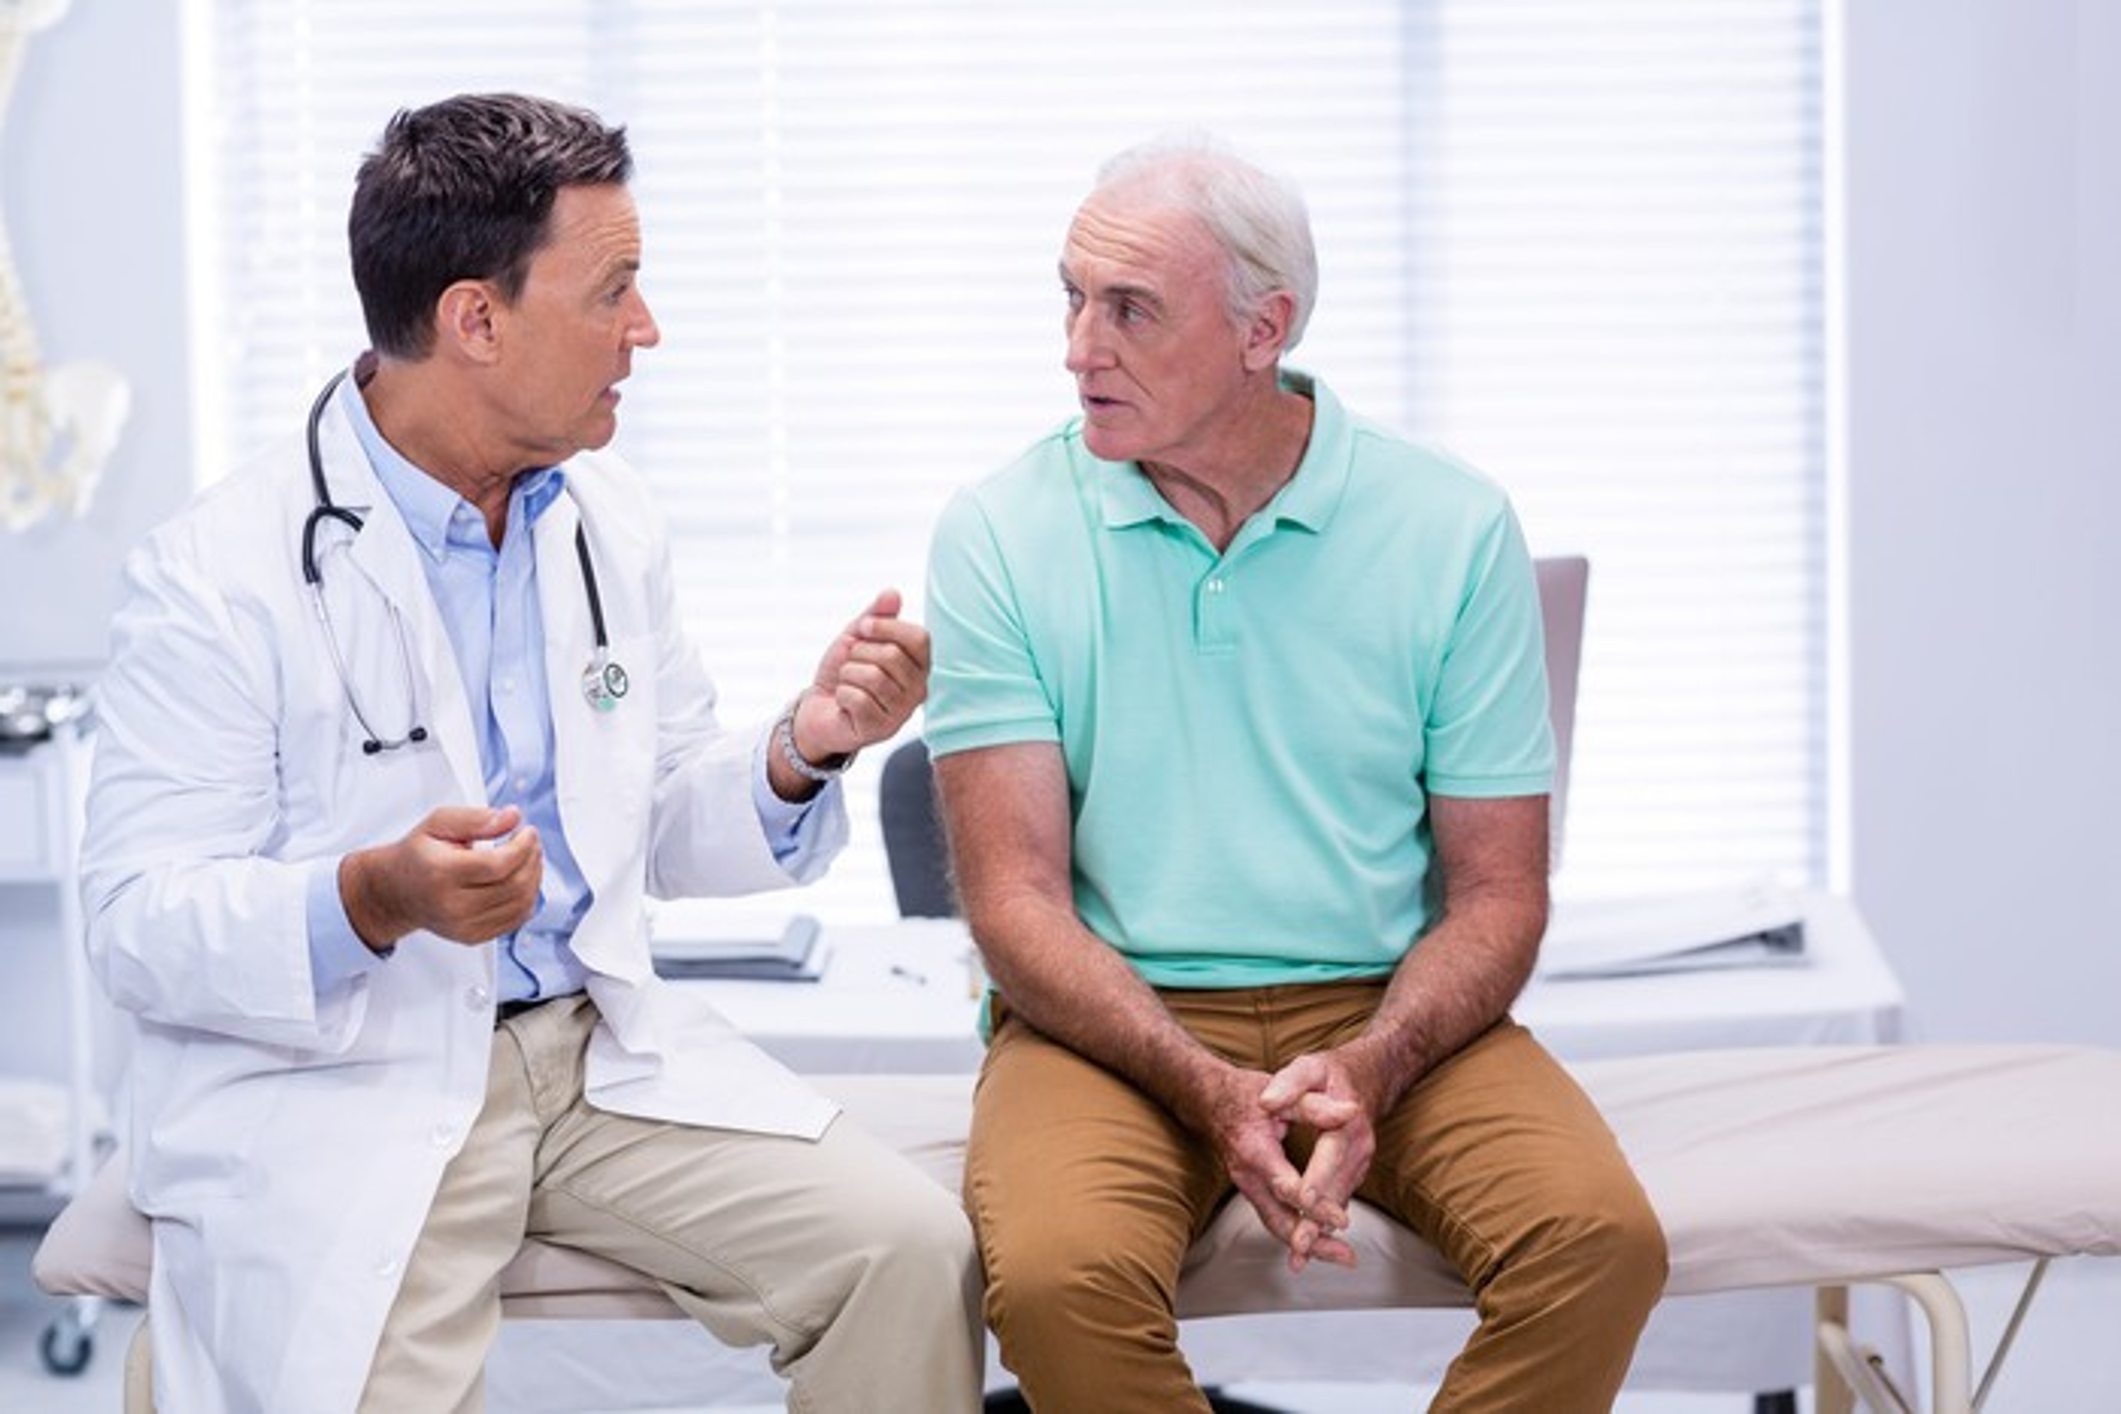 Doctor sitting next to senior man on exam table, talking